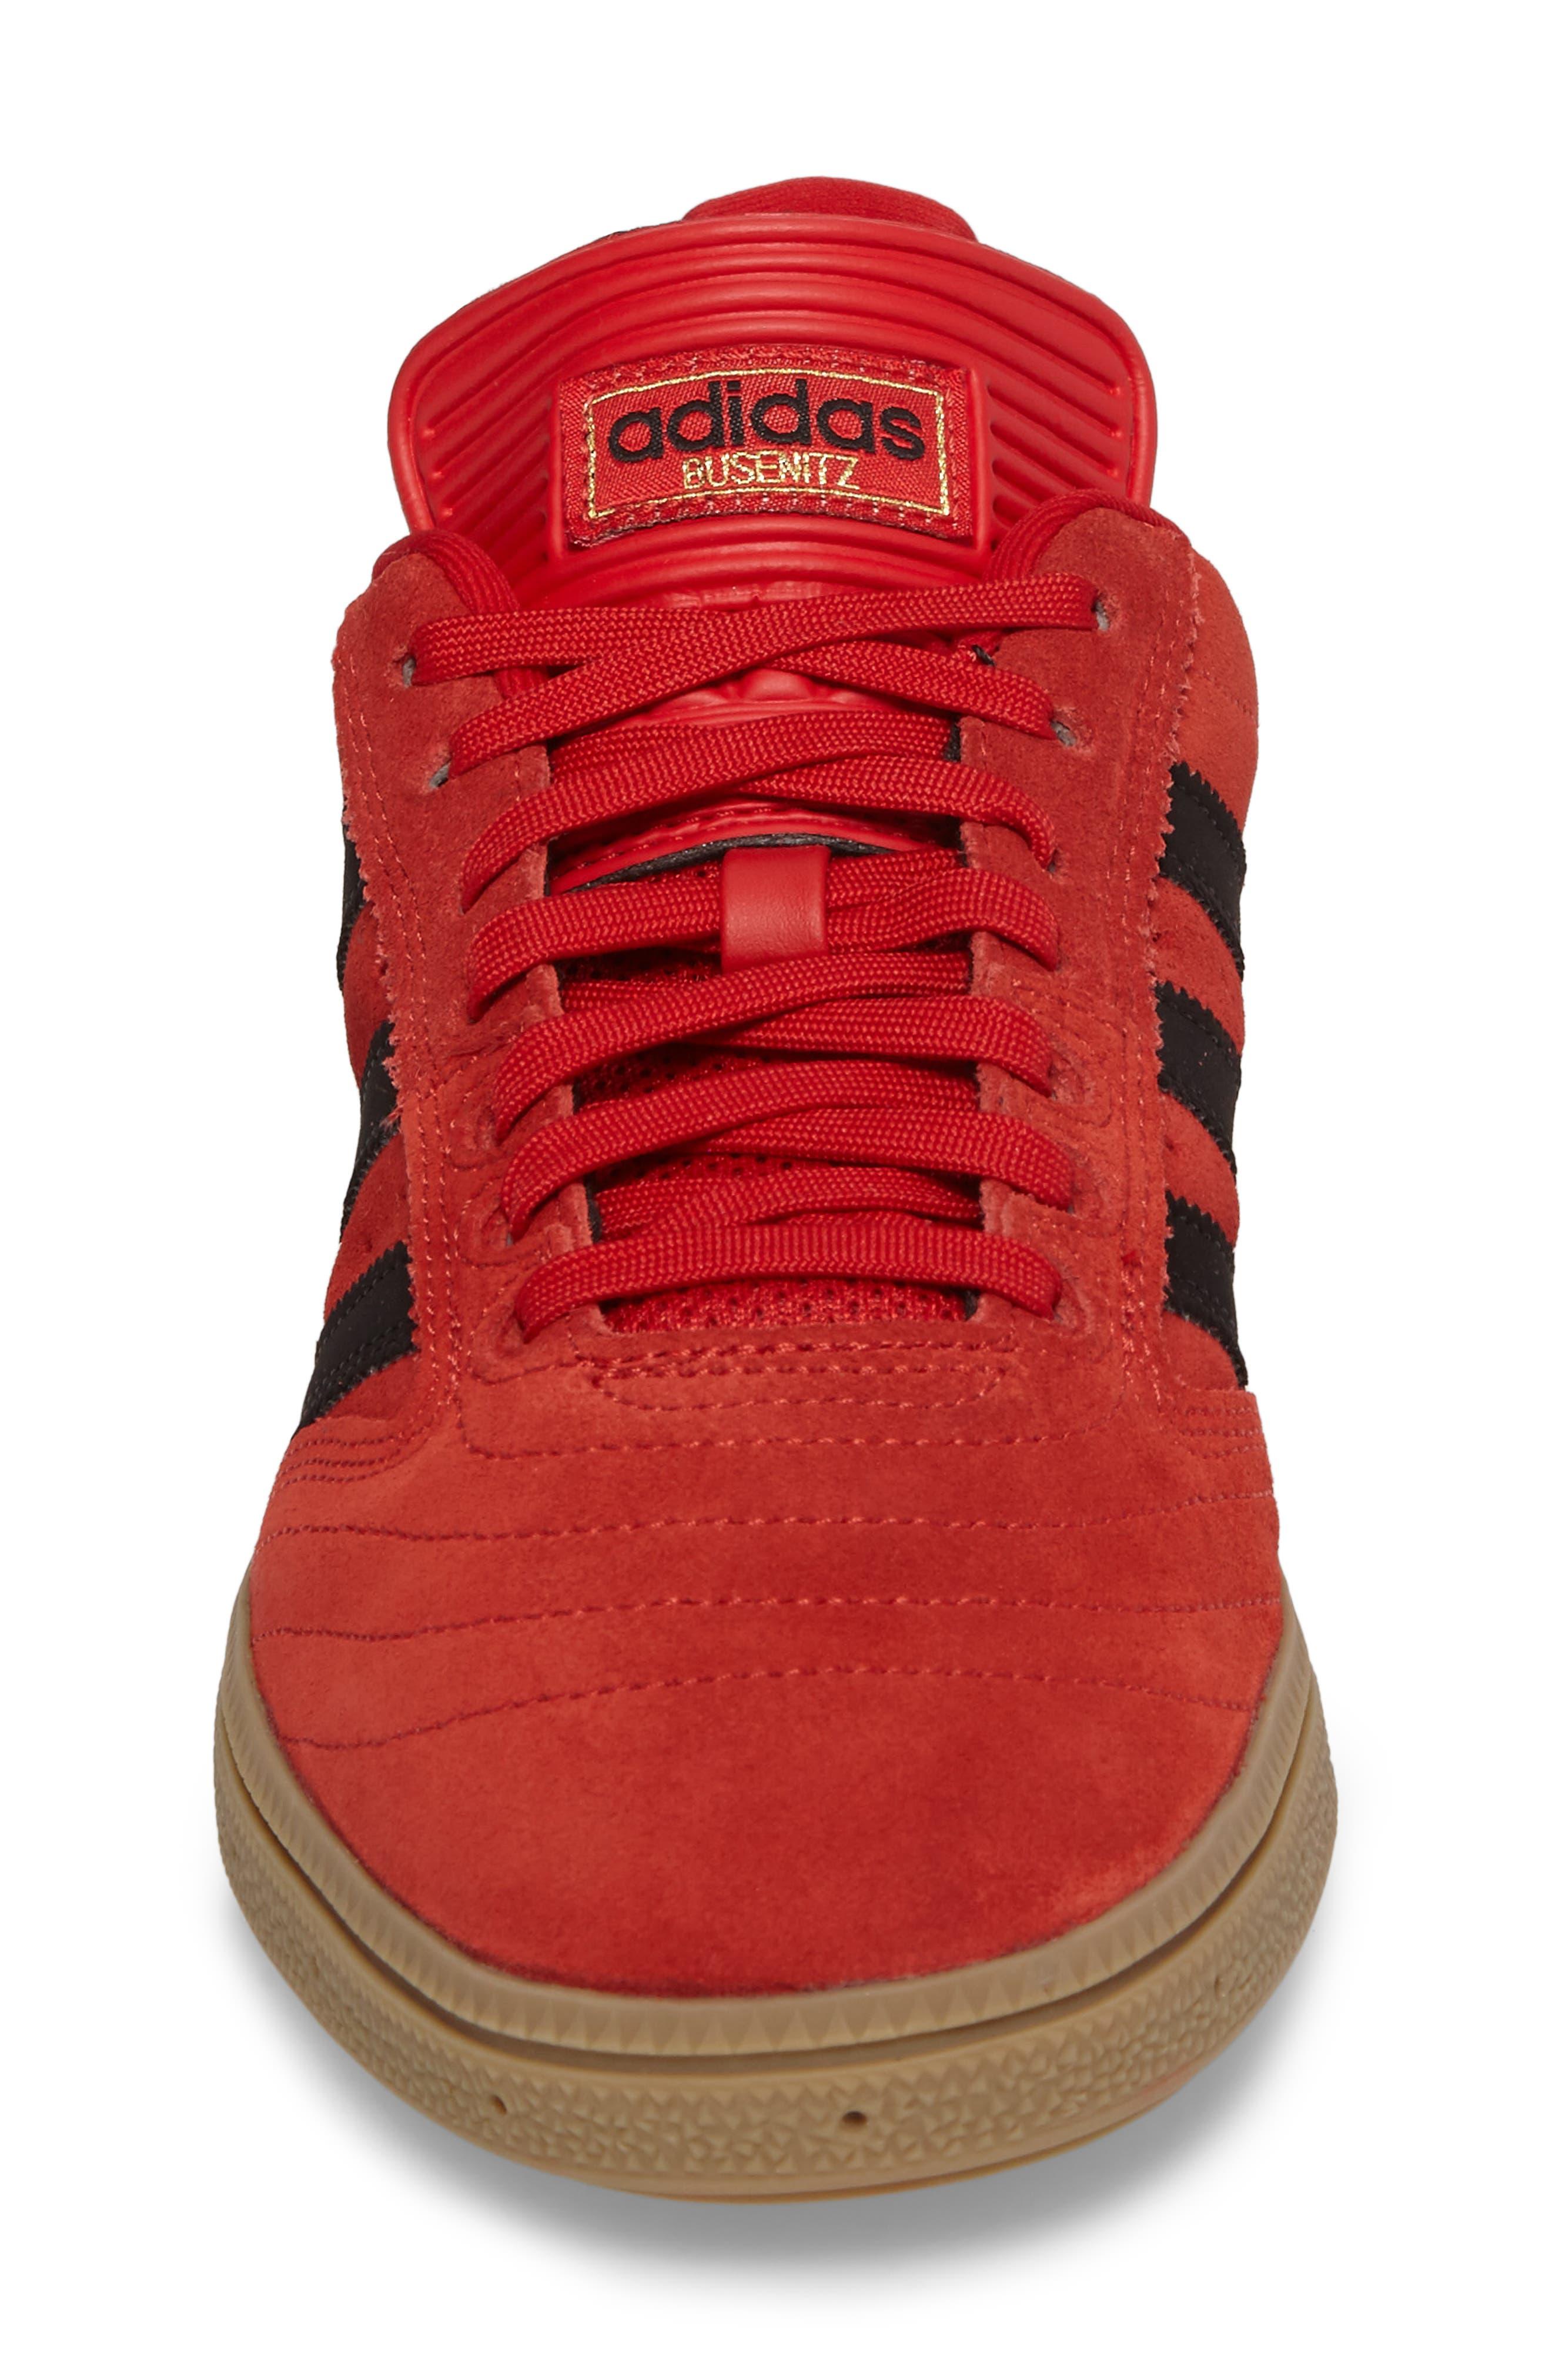 Busenitz Sneaker,                             Alternate thumbnail 4, color,                             Scarlet/ Core Black/ Gum4